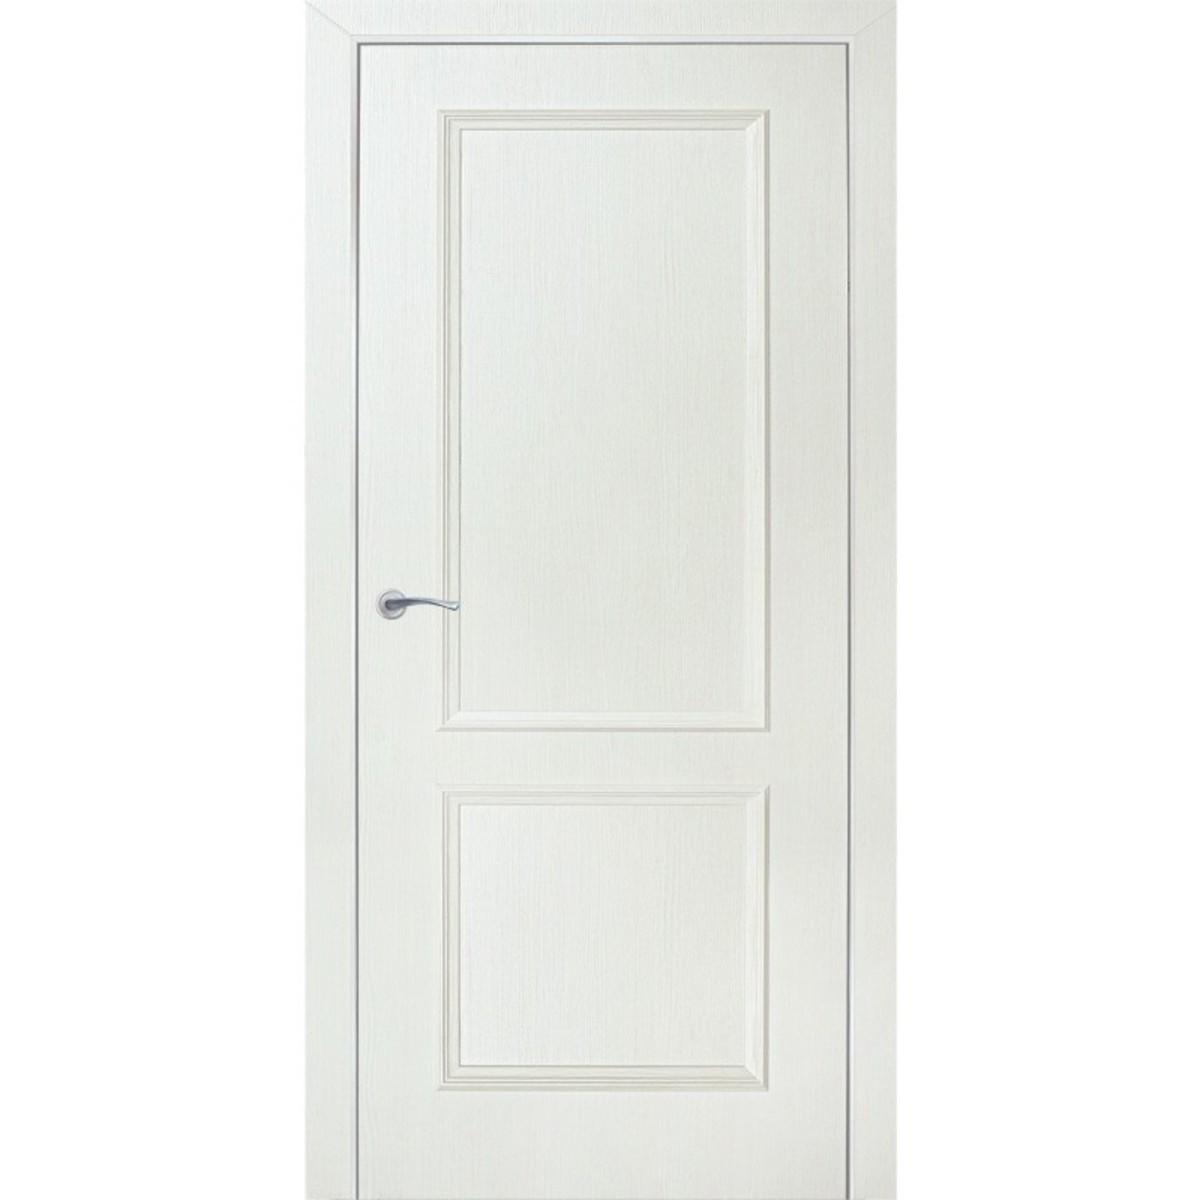 Дверь межкомнатная глухая Altro 80x200 см ламинация цвет бьянко 3D